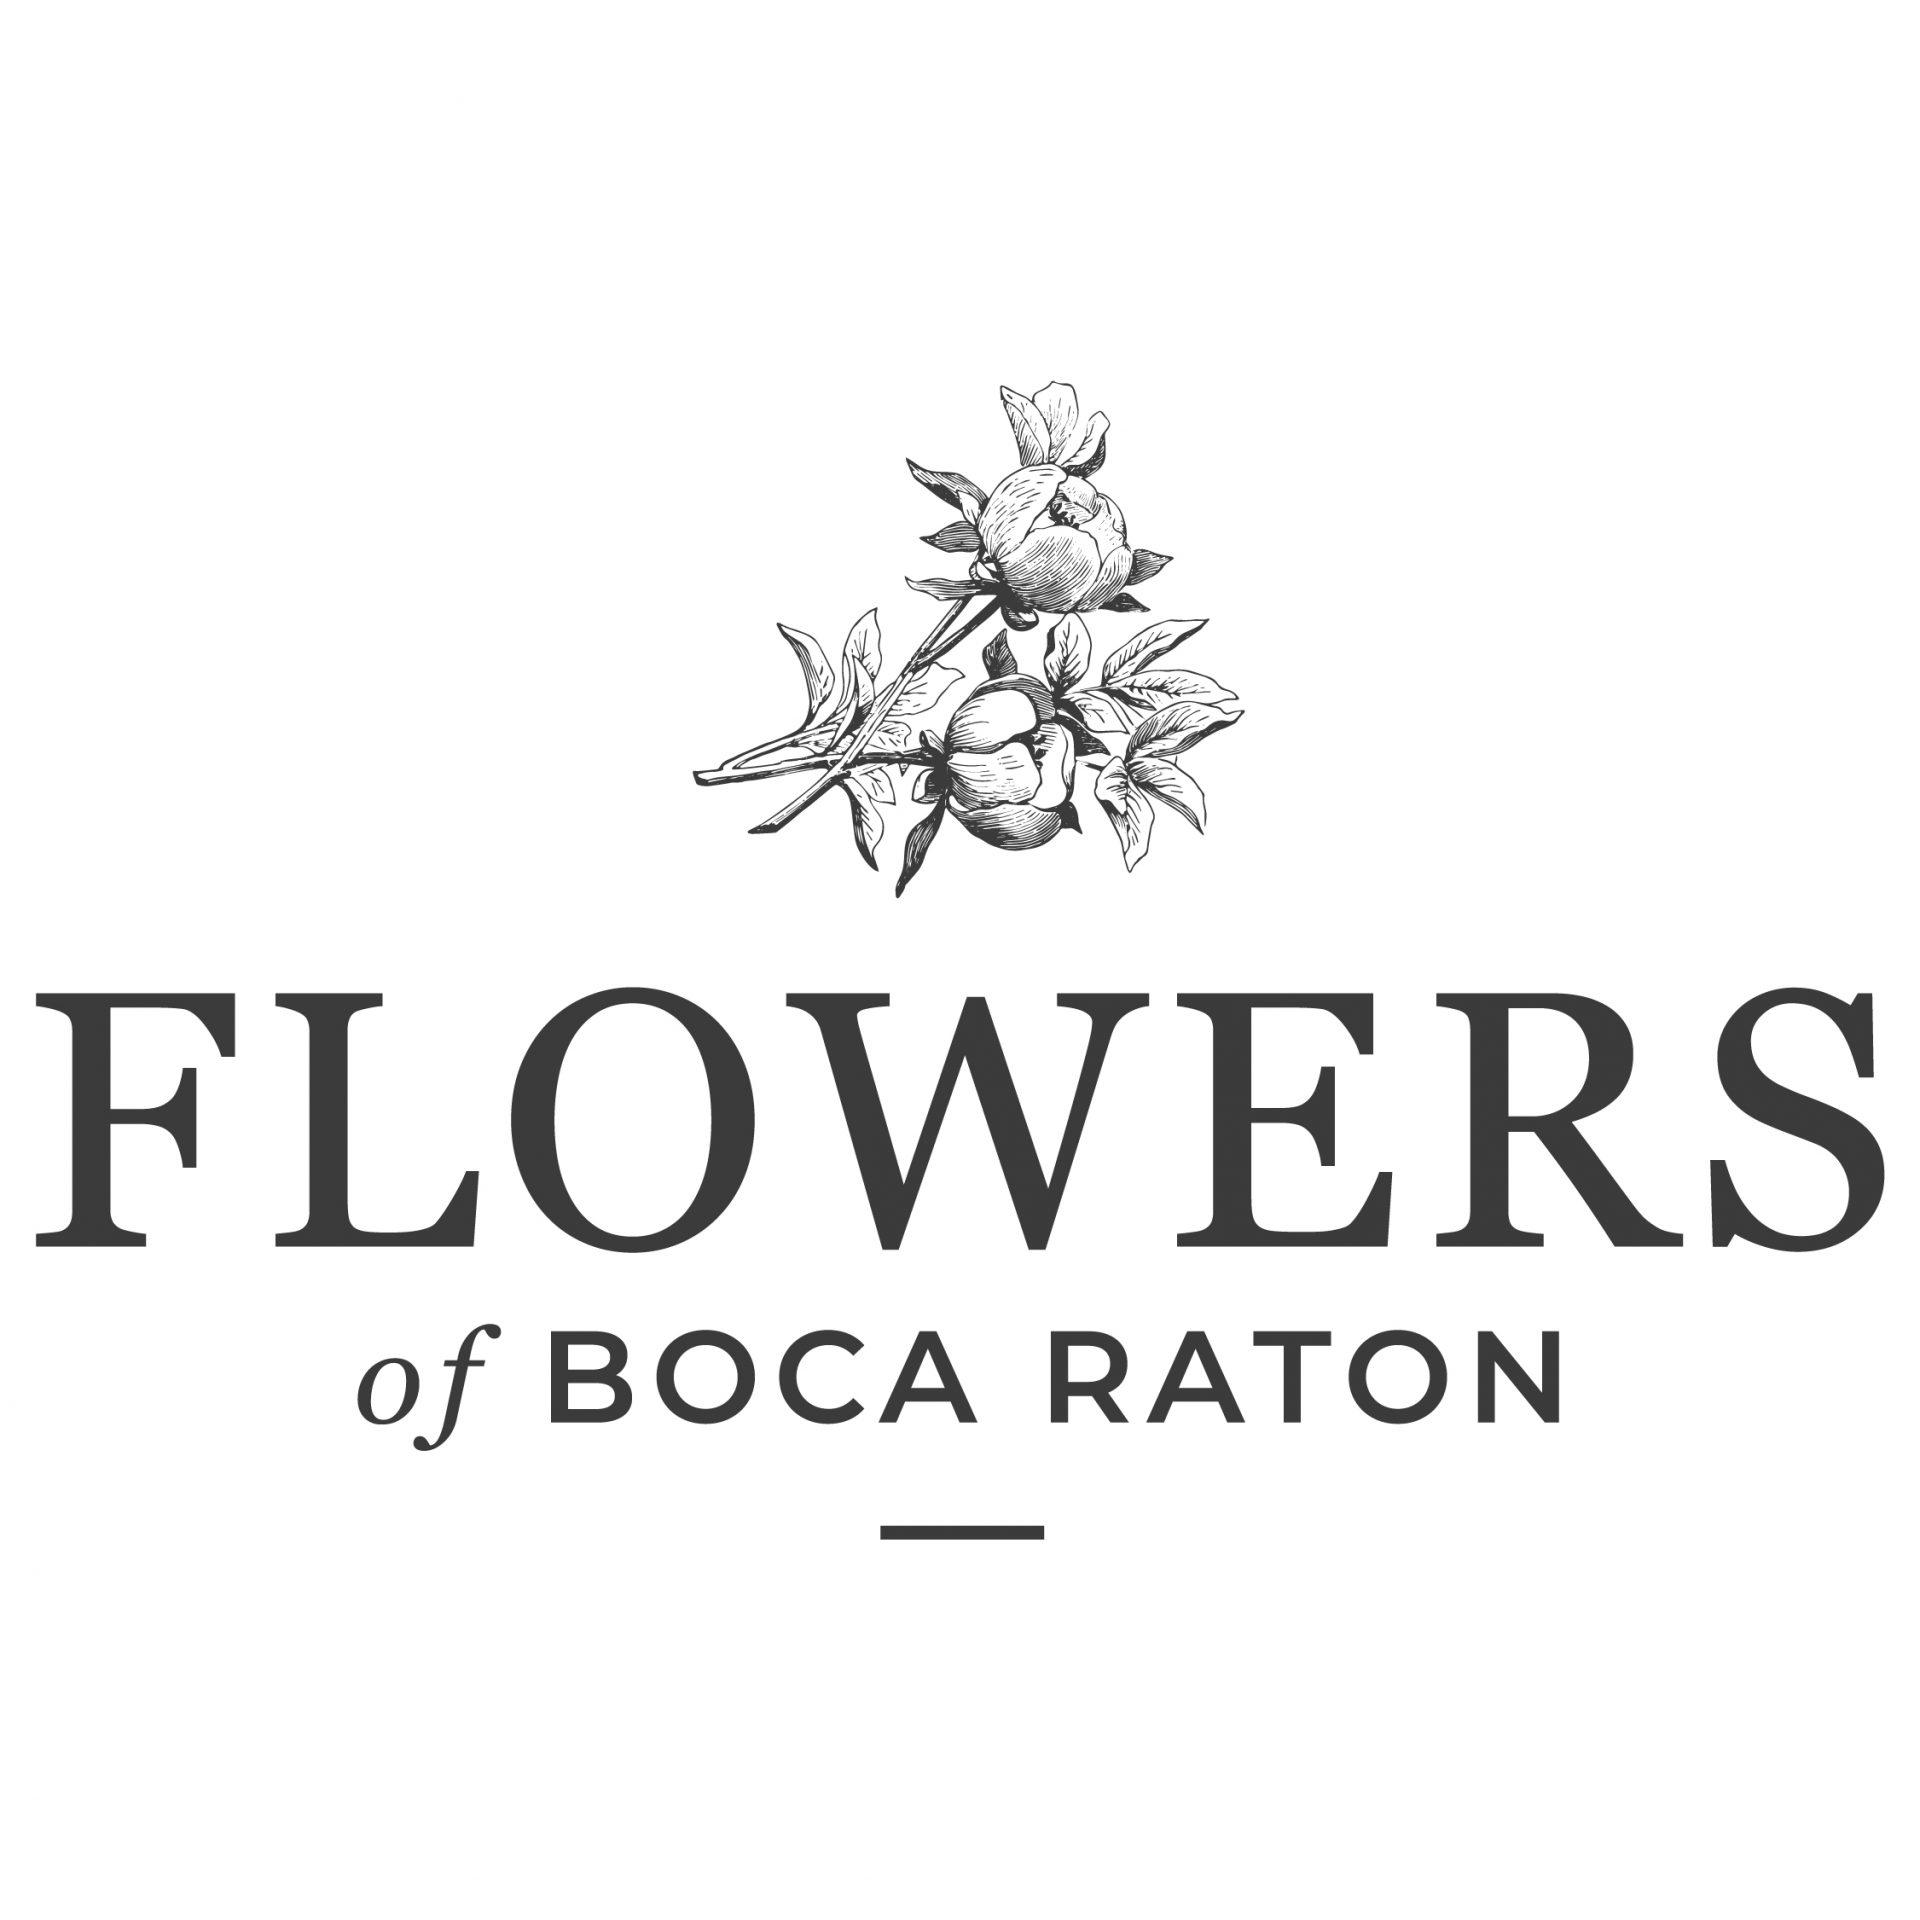 Flowers of Boca Raton - Logo